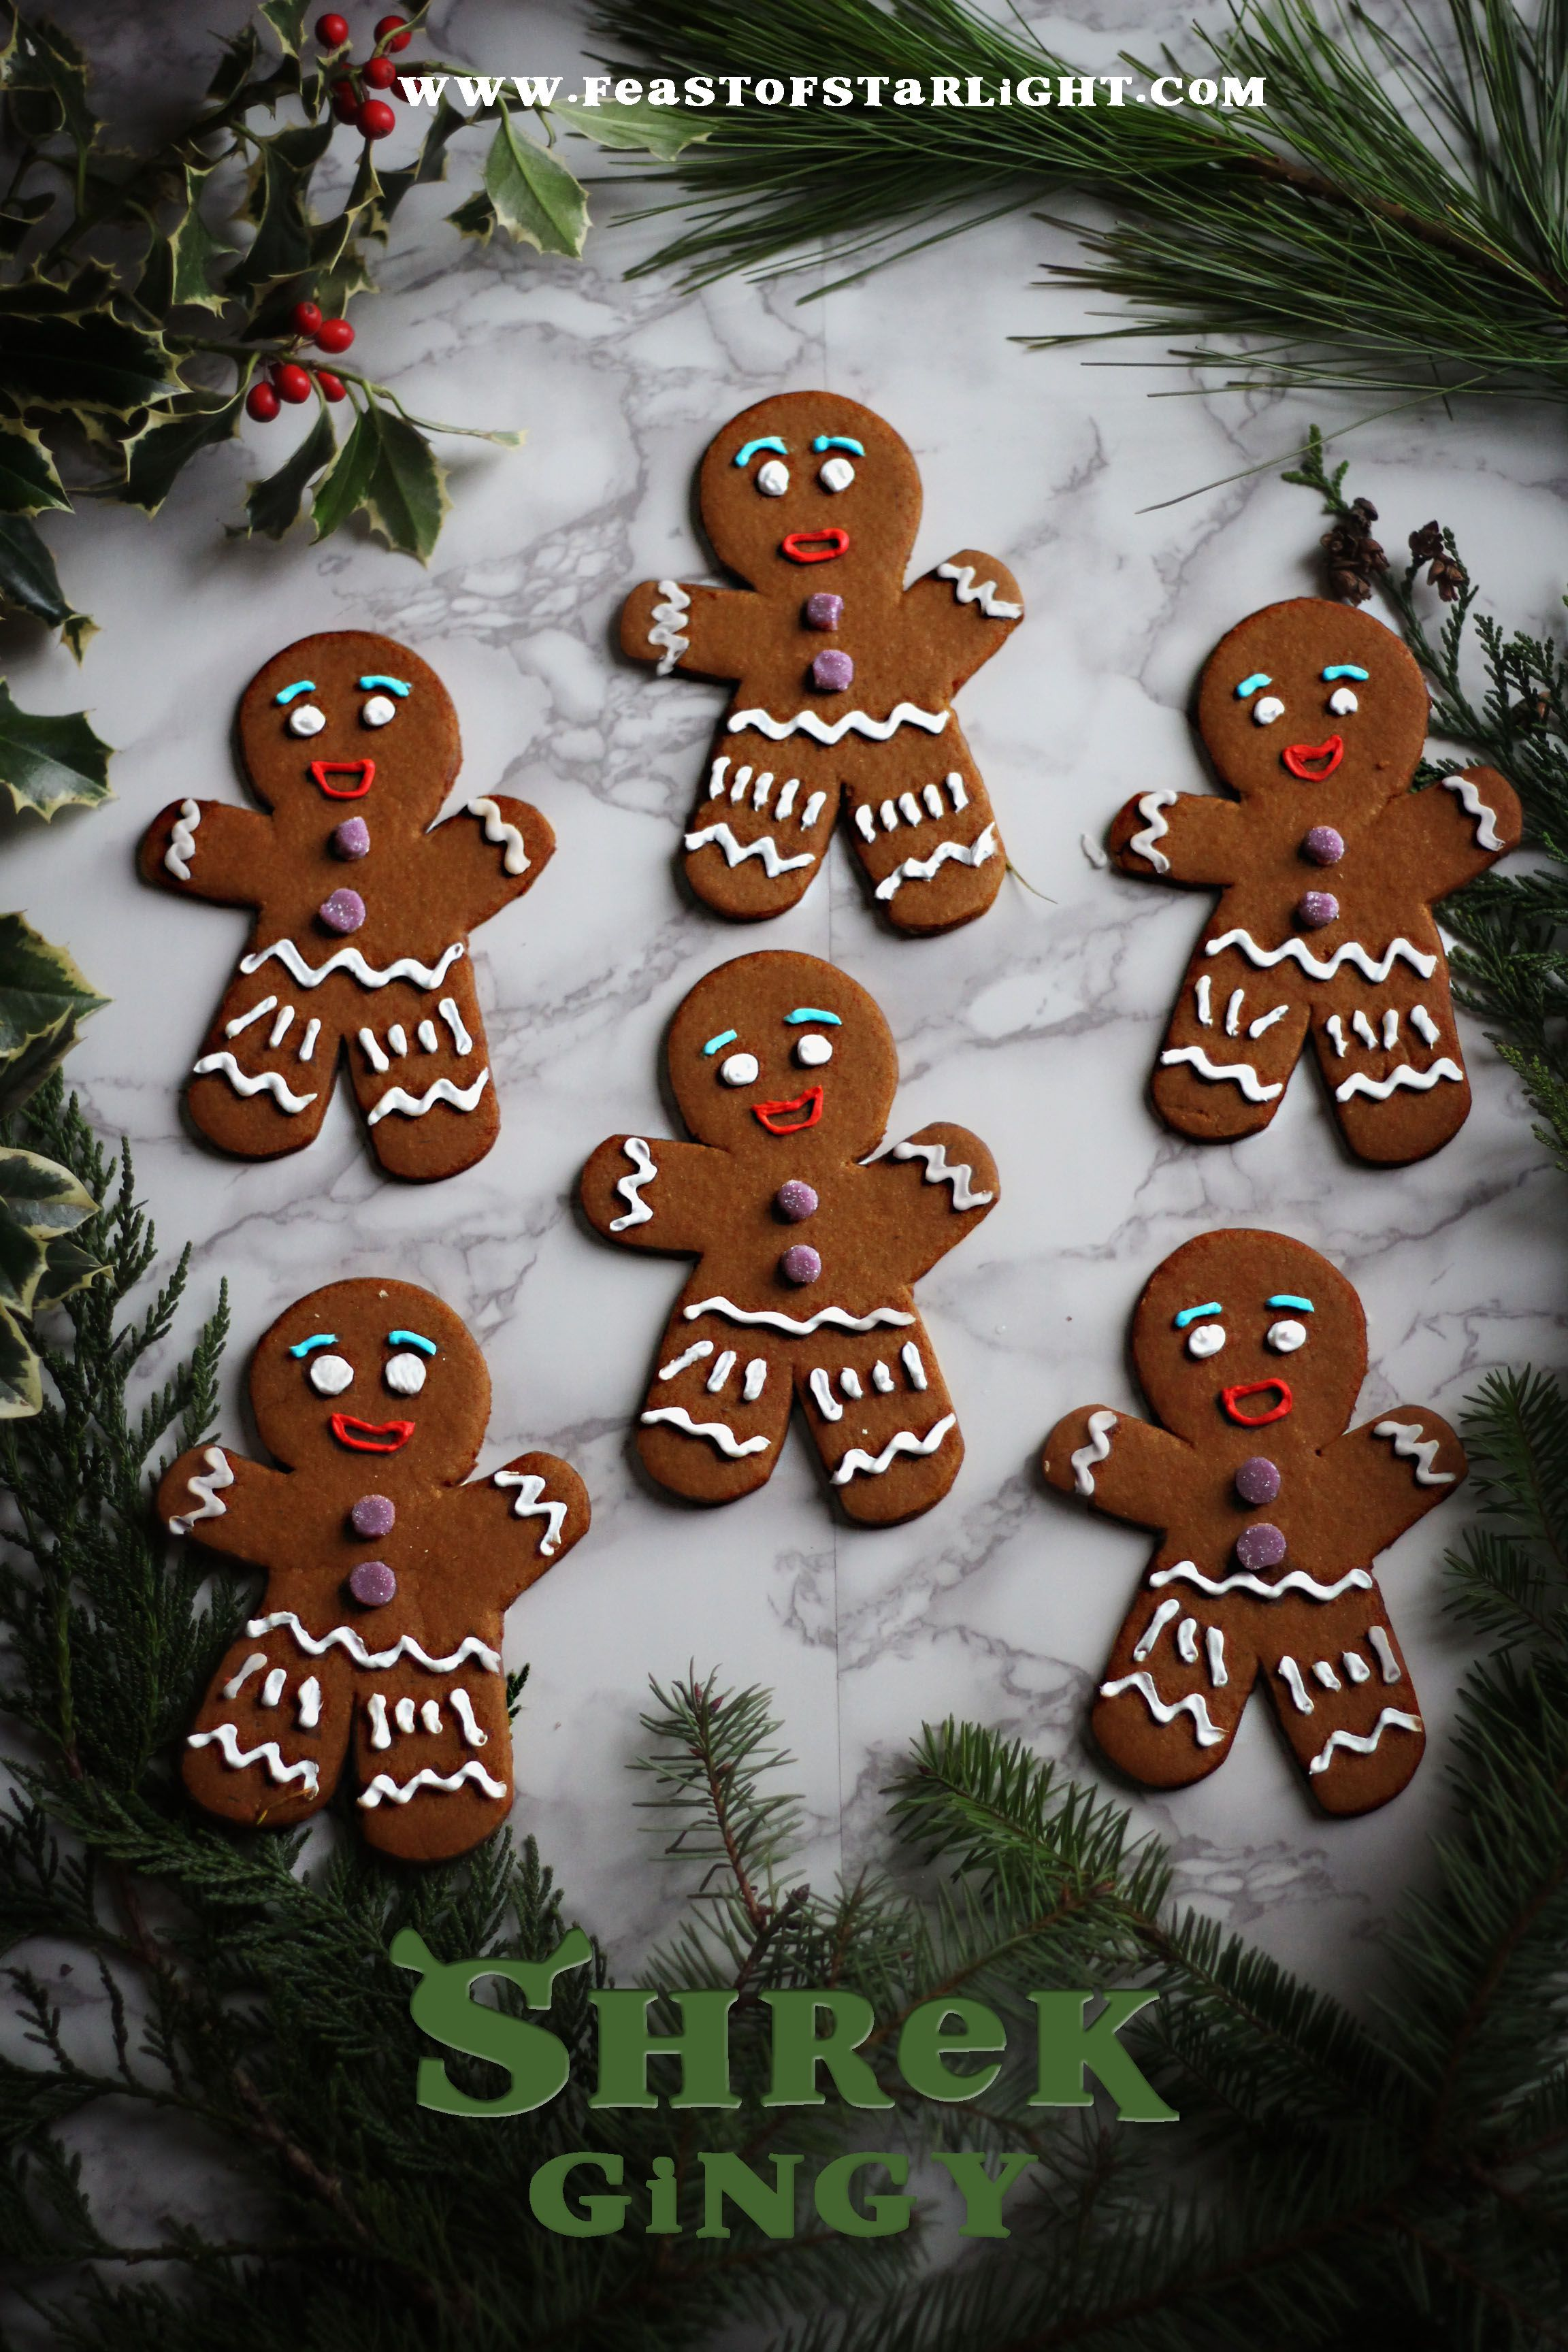 Shrek Gingy The Gingerbread Man Recipe Shrek Gingerbread Man